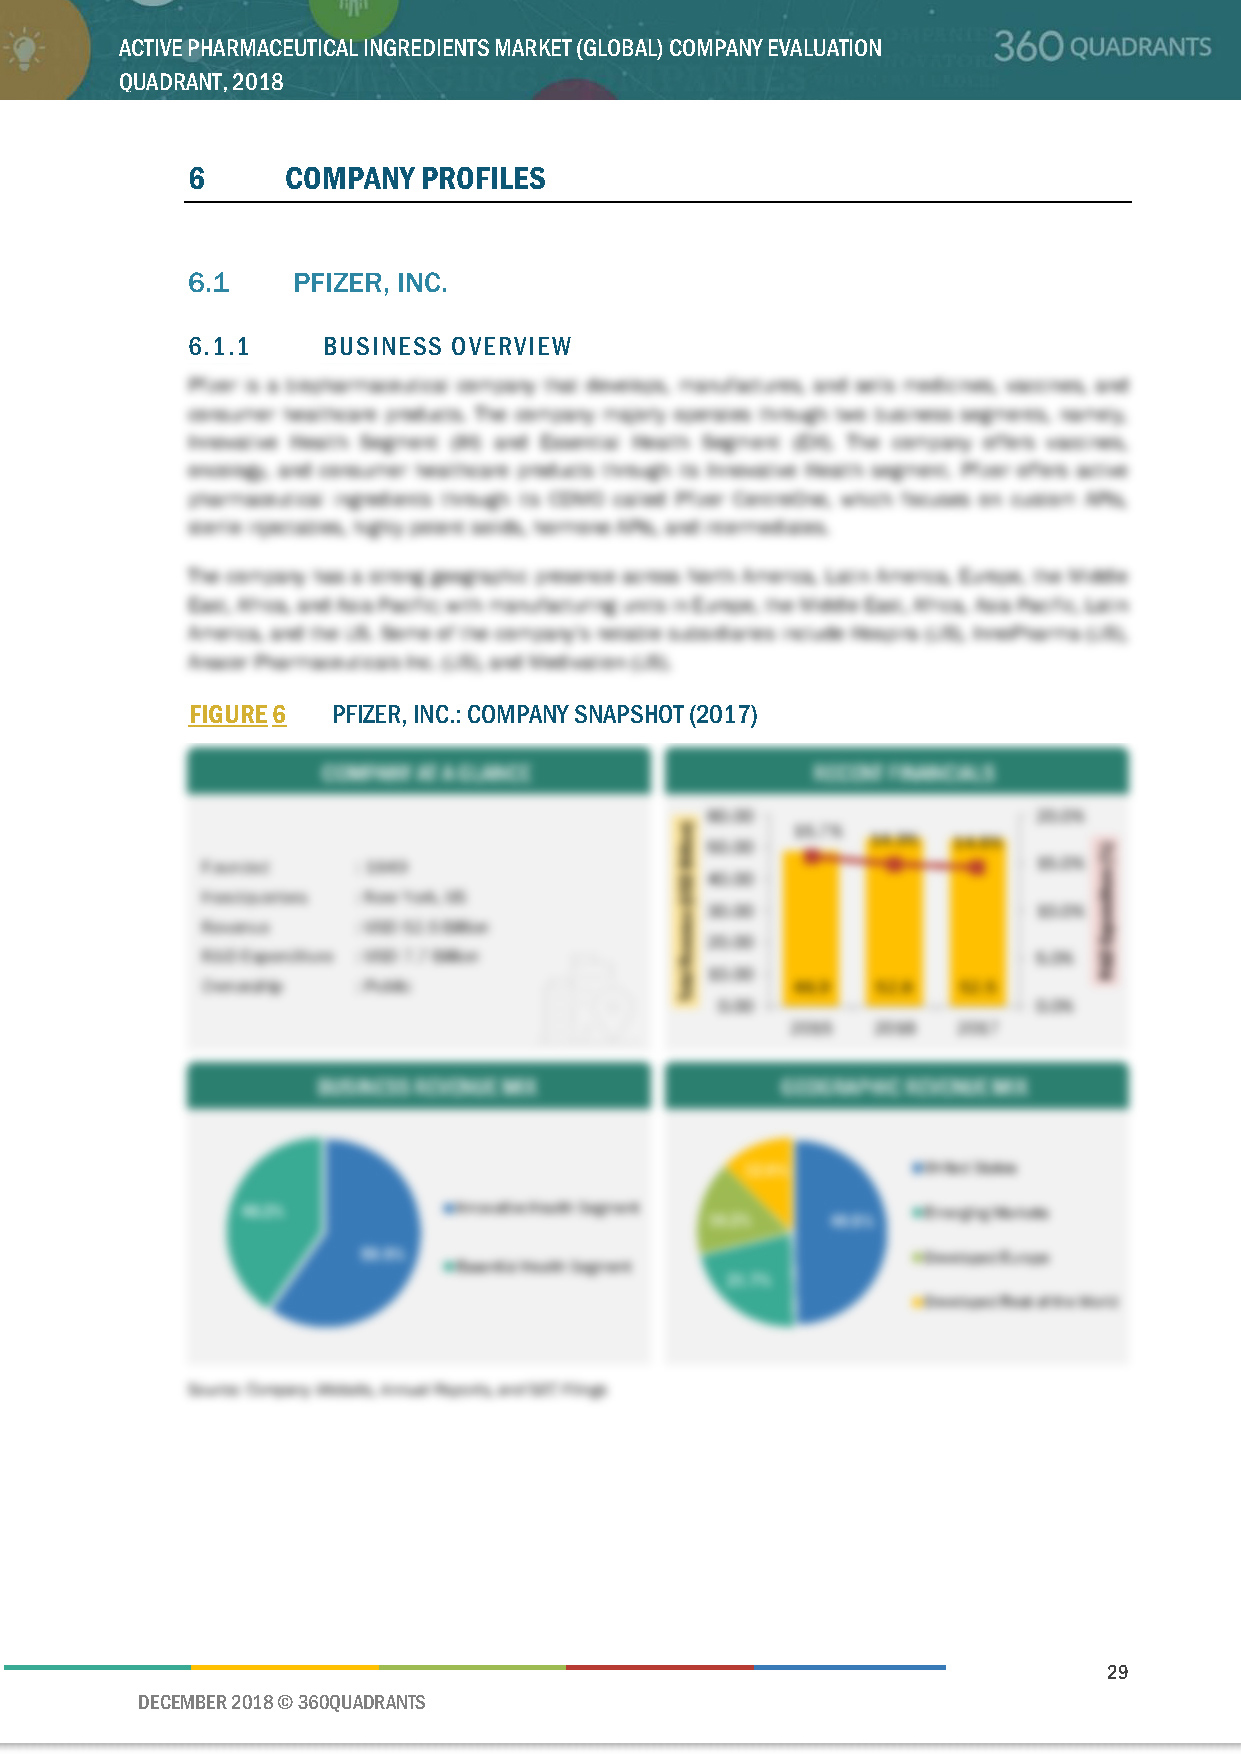 Active Pharmaceutical Ingredients Companies